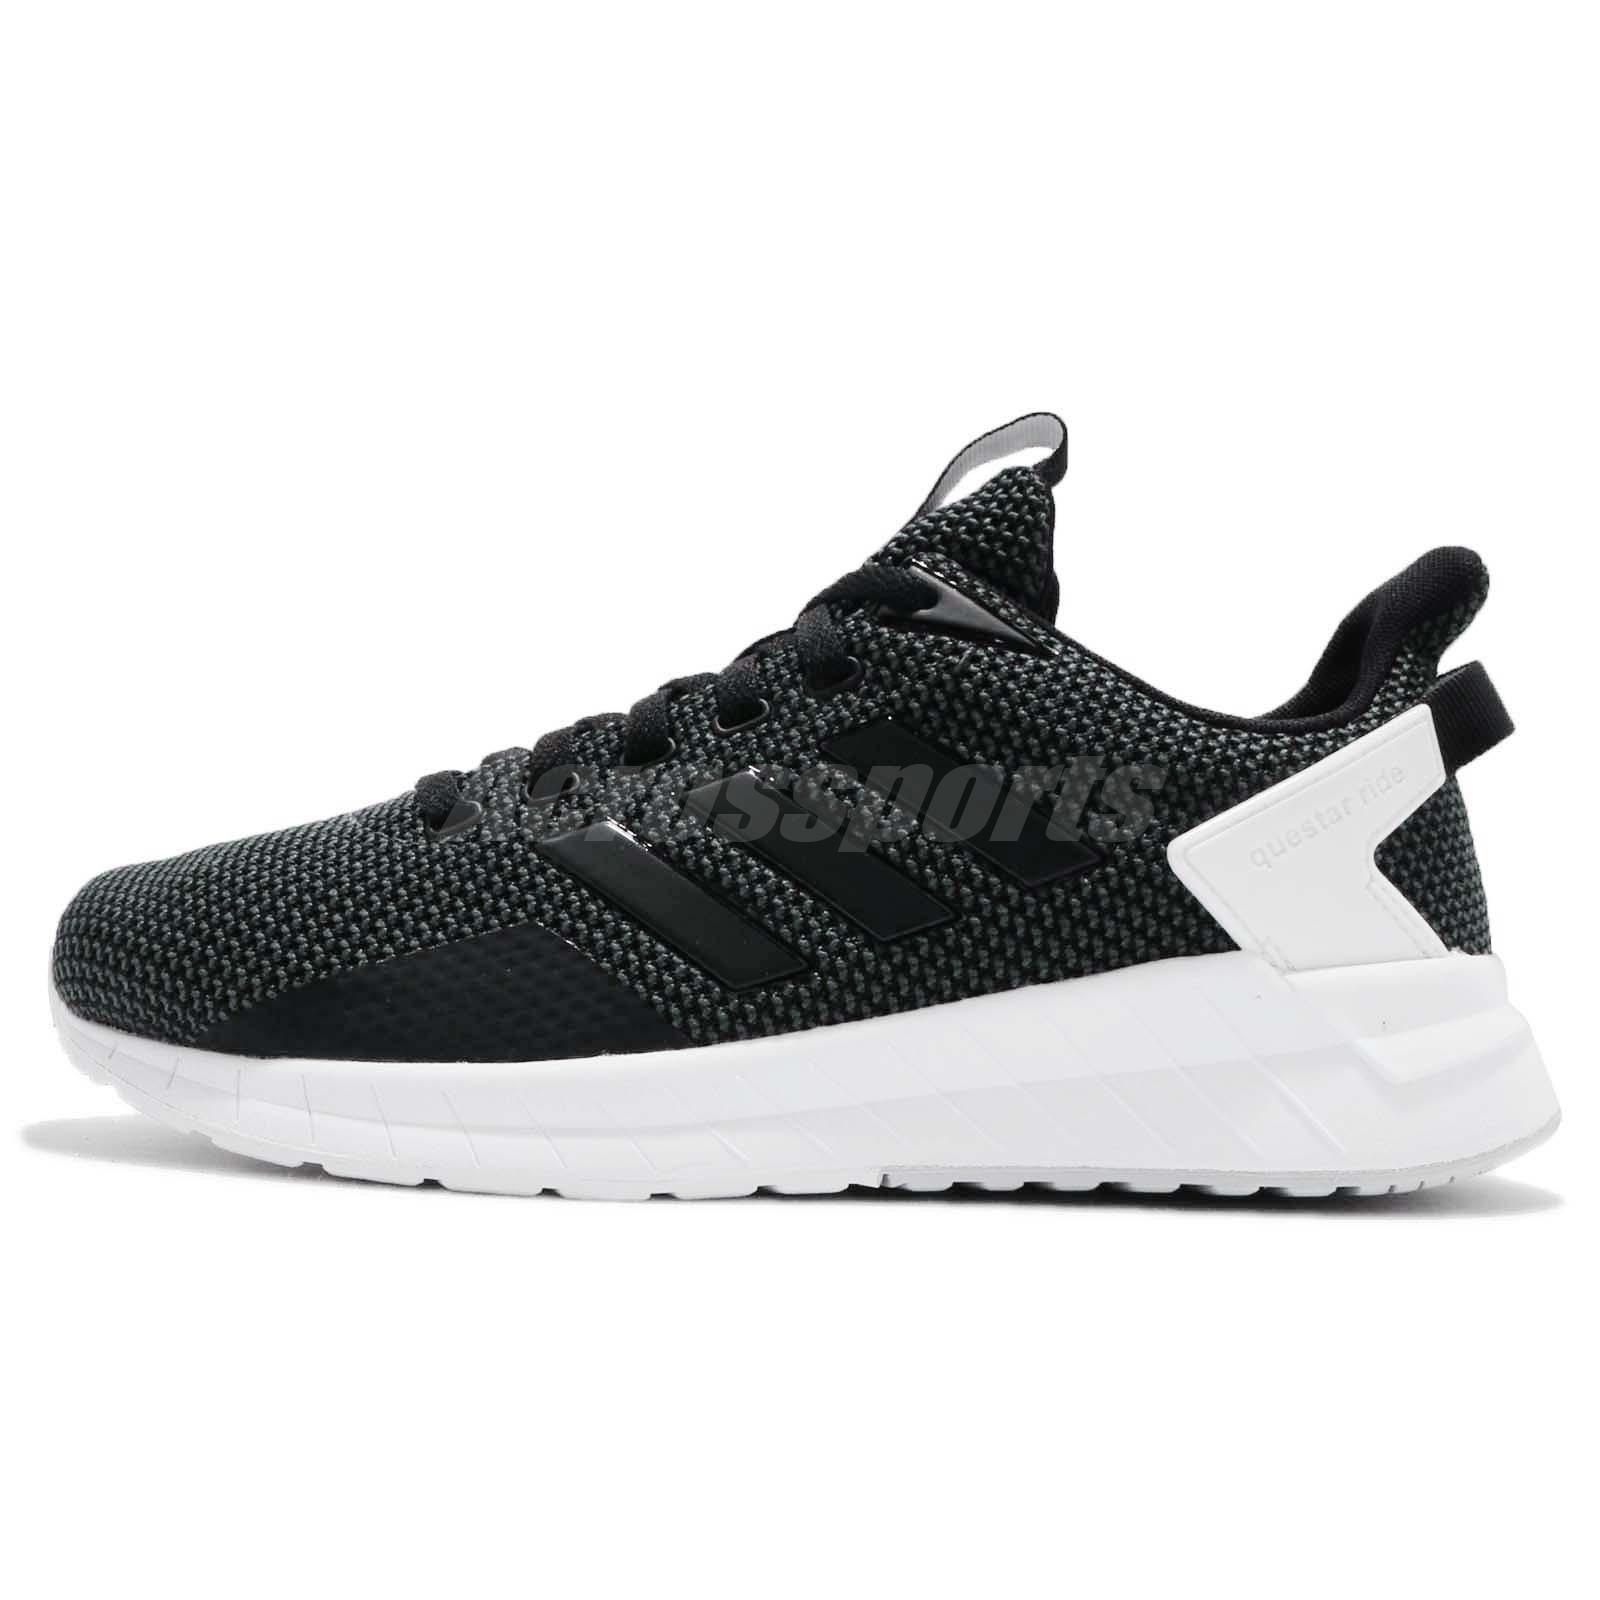 65f5153455b360 adidas Questar Ride Carbon Black Women Running Shoes Sneakers DB1308 ...